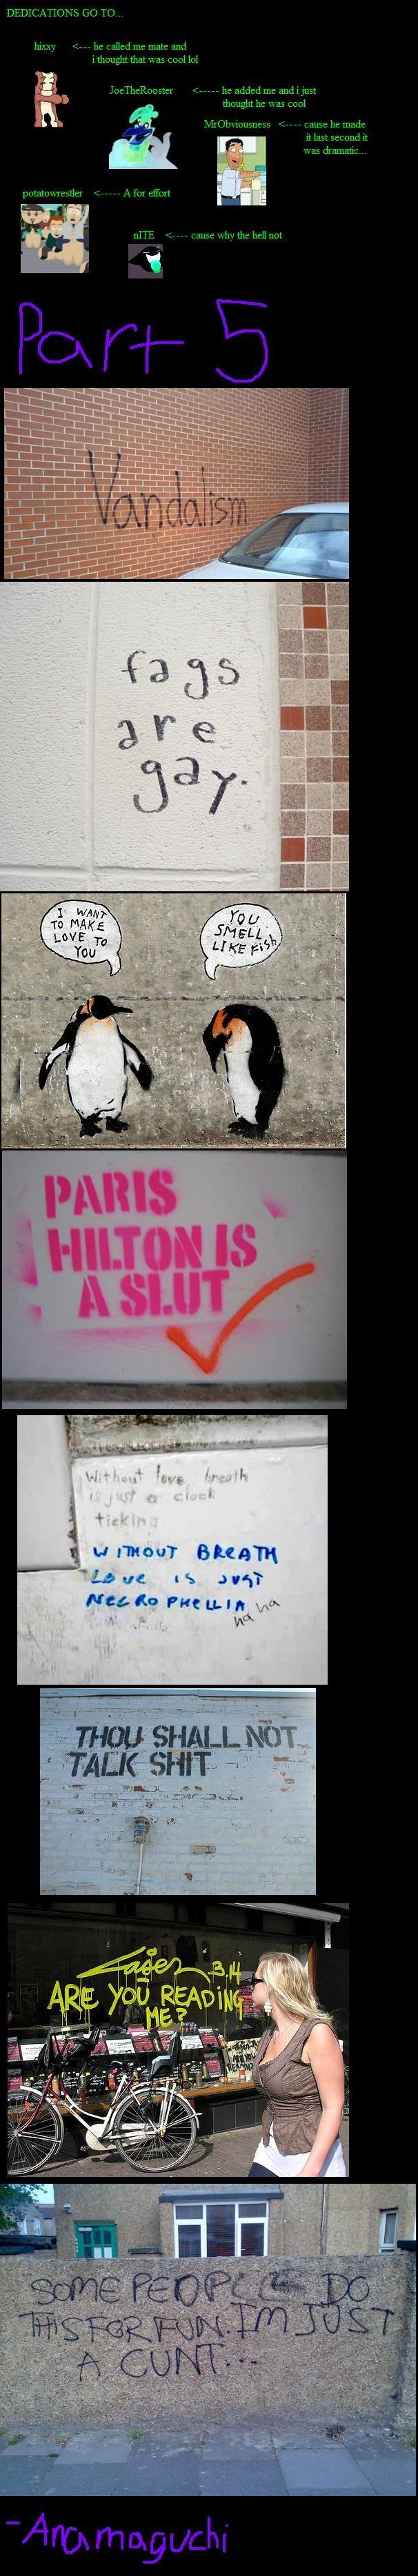 Funny Graffiti Compilation pt5. part8:<br /> <br /> part7:<br /> <br /> part6:<br /> <br /> Part1:<br /> tures/6066 30 Graffiti anamaguchi